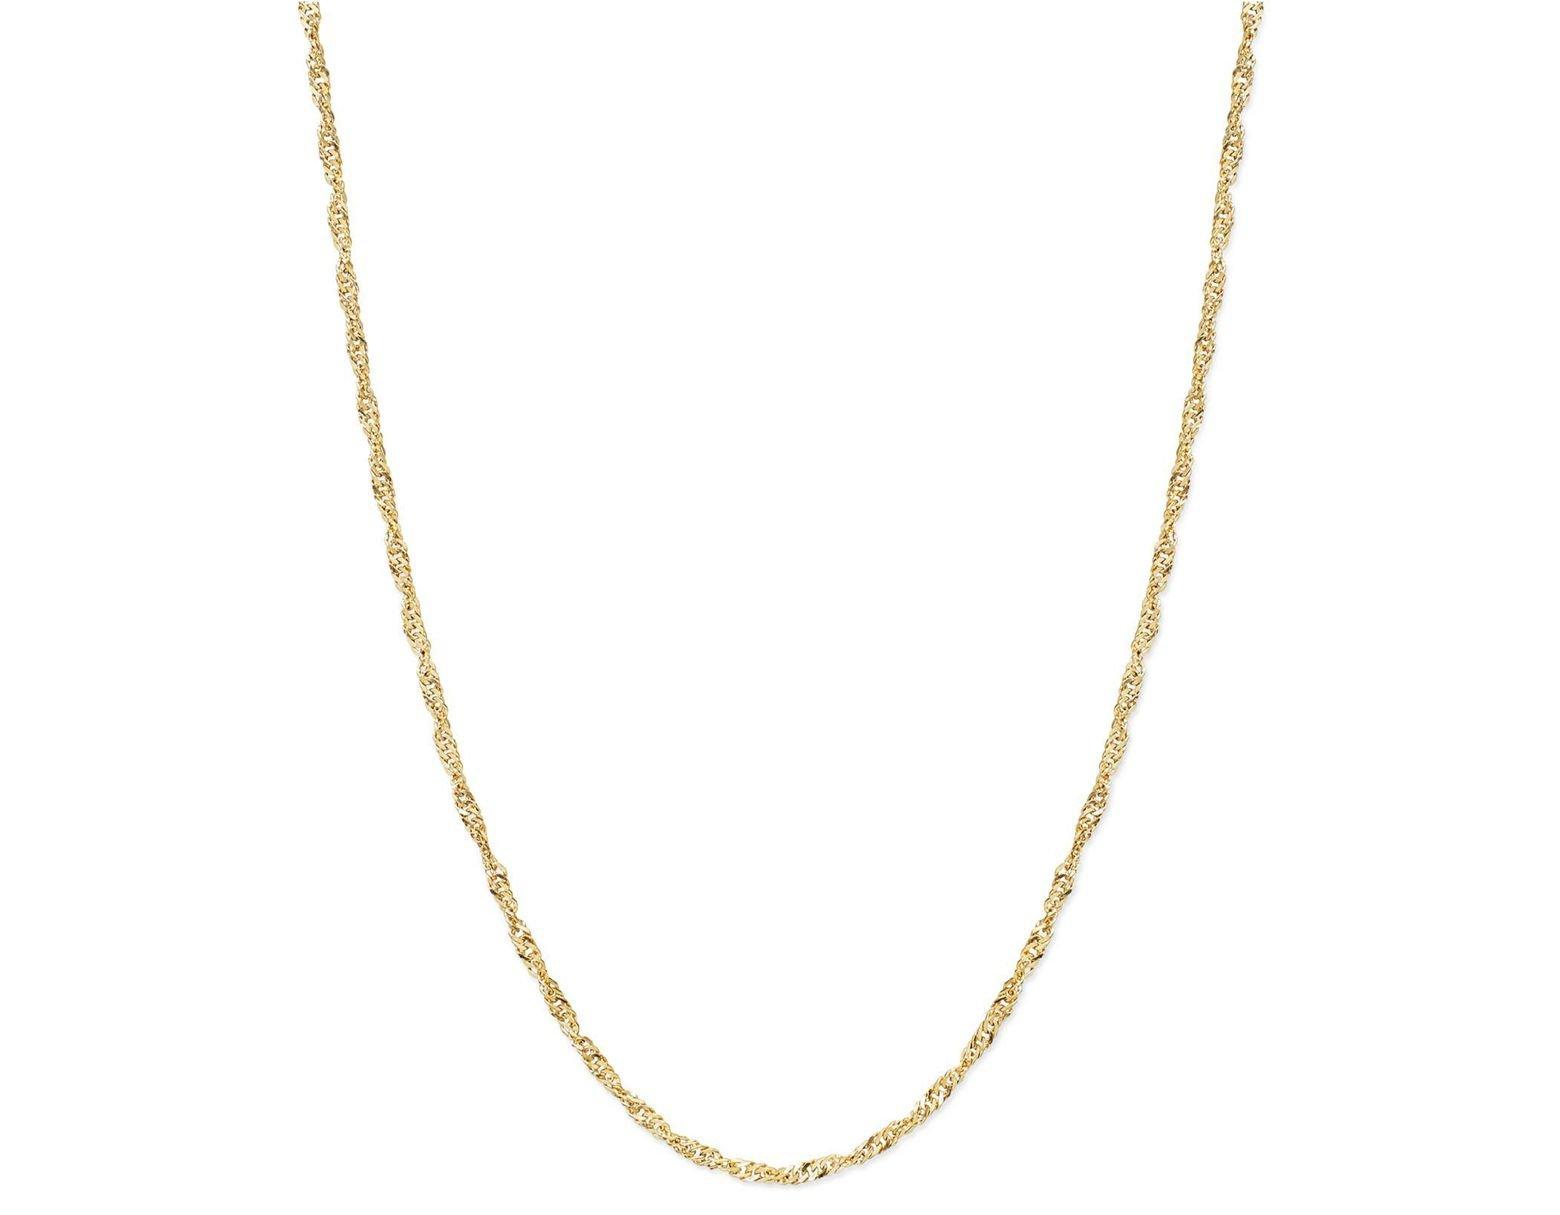 fa14639f74a6e Women's Metallic 14k Gold Necklace, 24